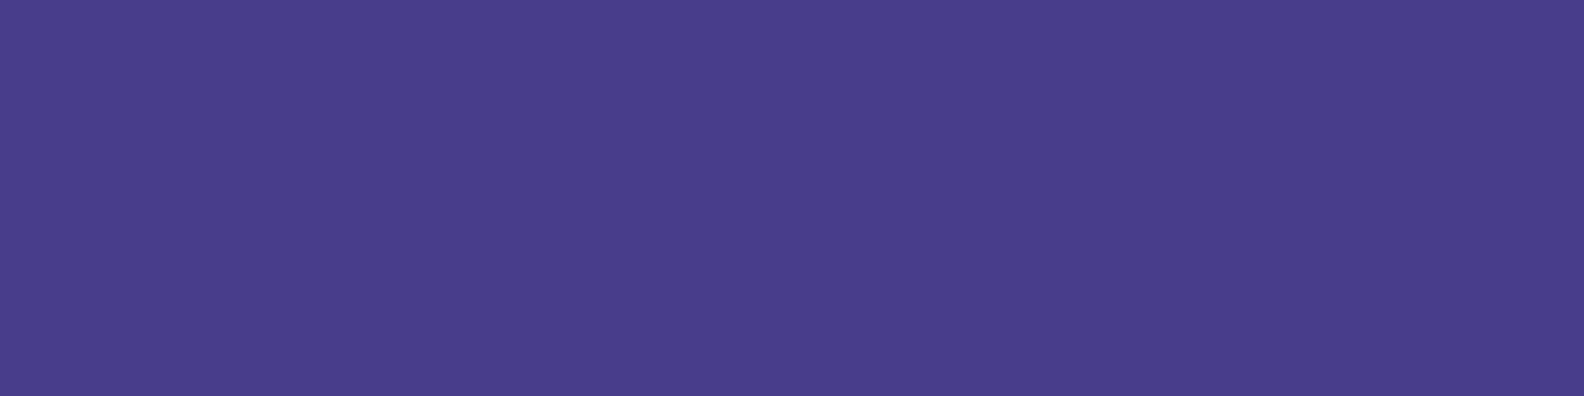 1584x396 Dark Slate Blue Solid Color Background